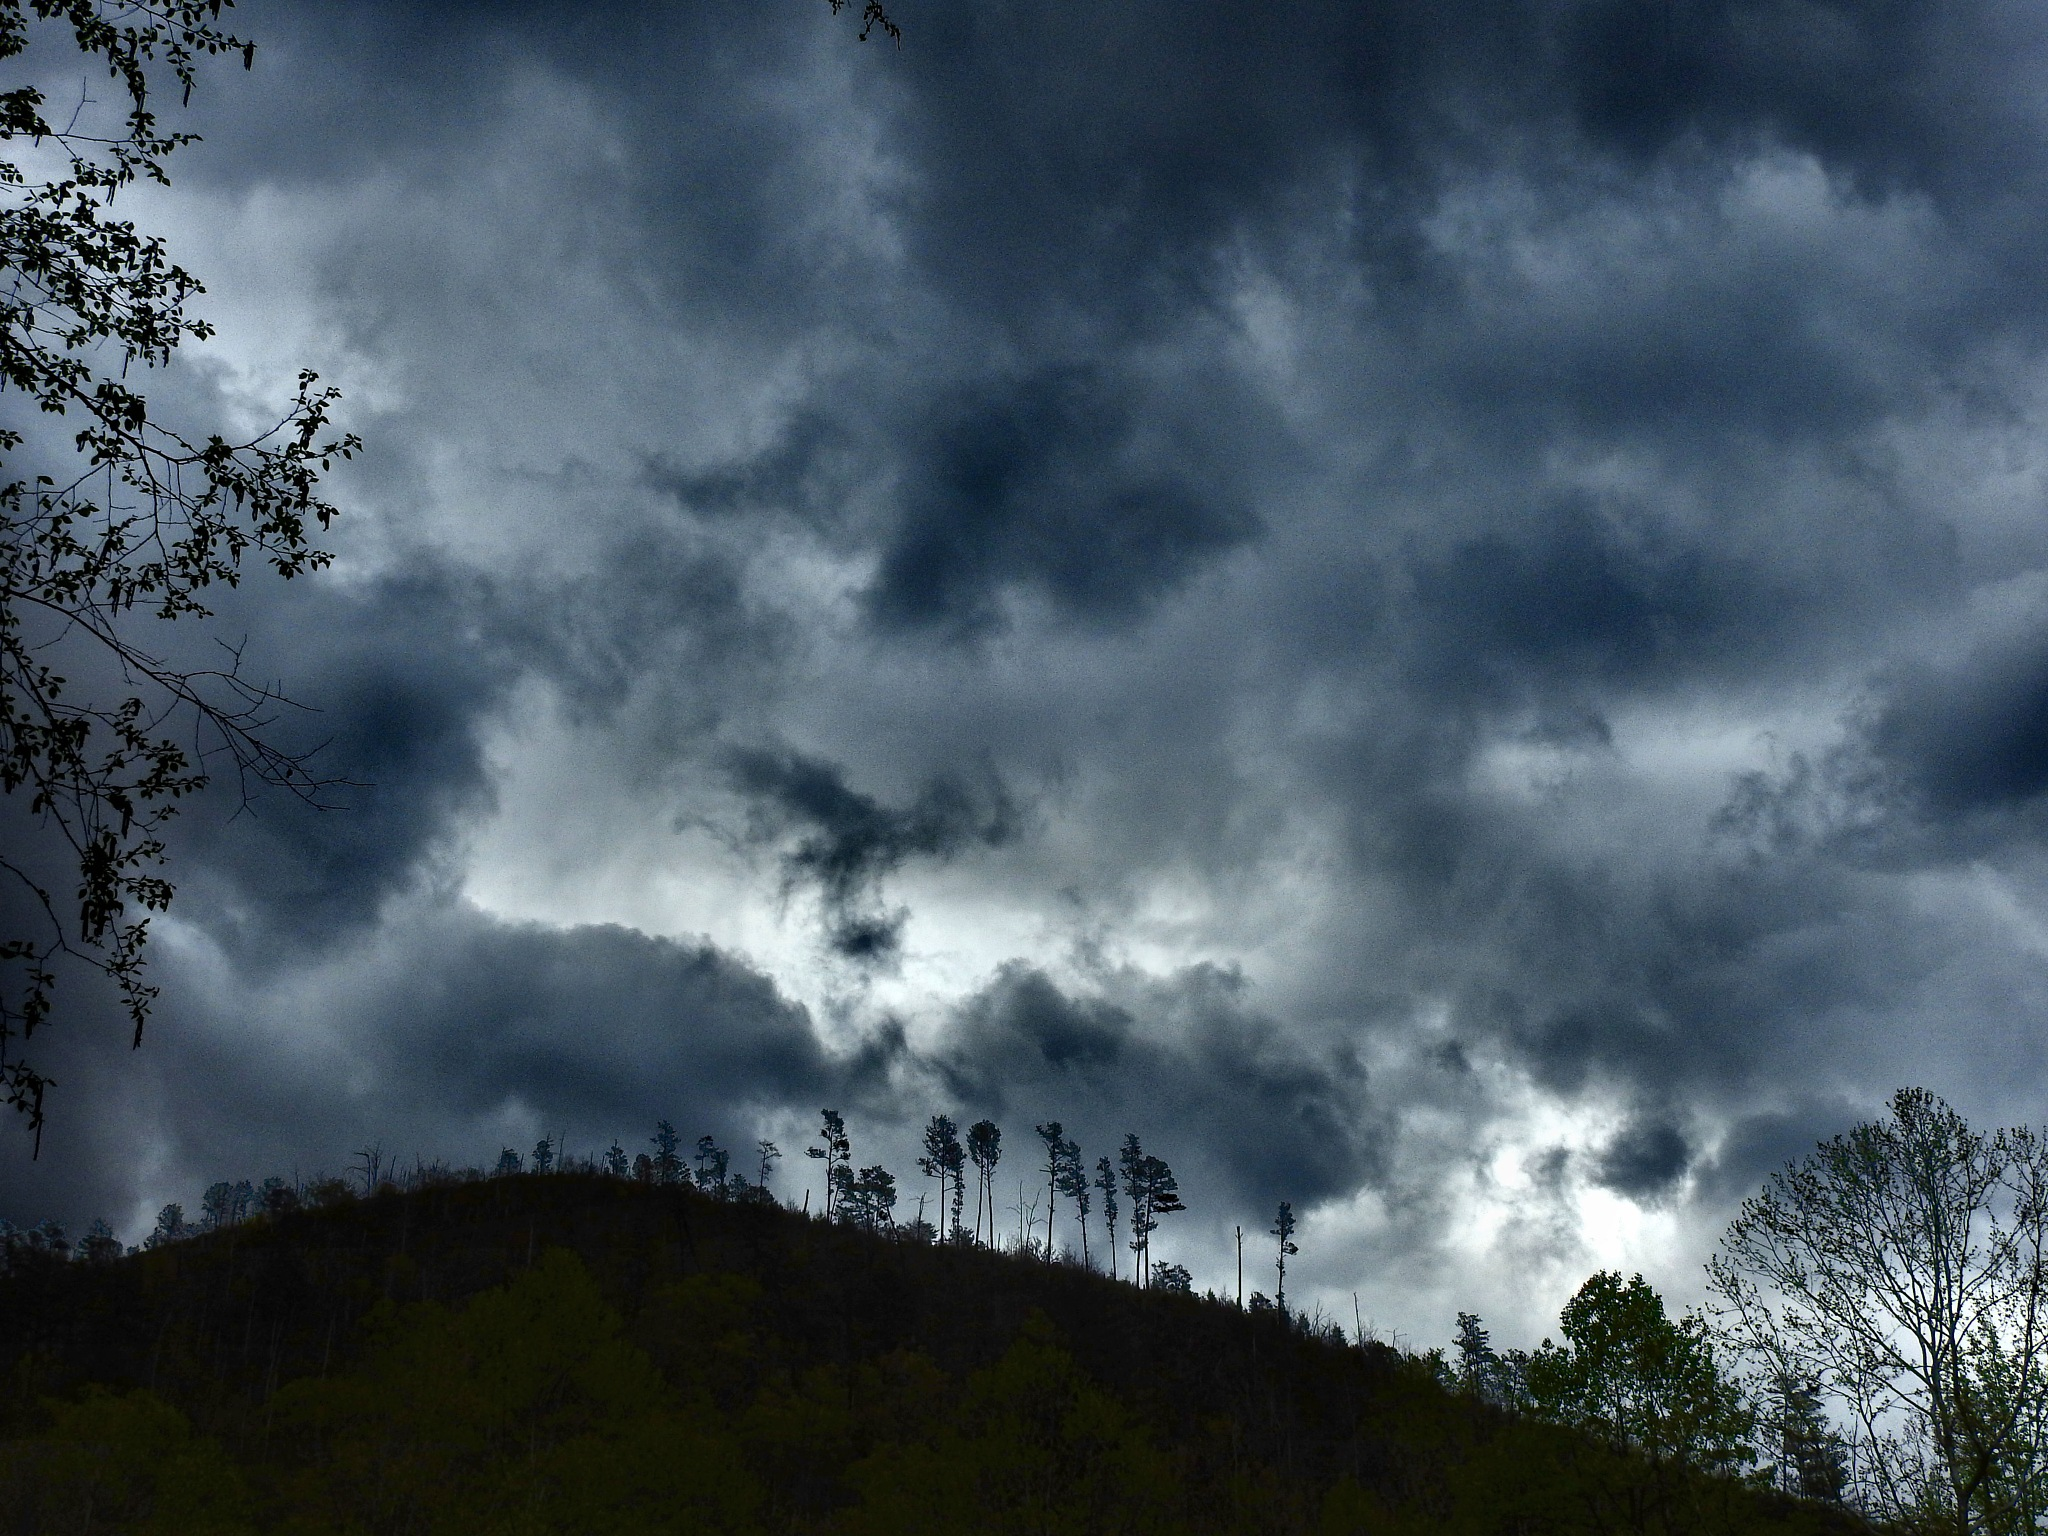 Mountain Rainy Days by Patty Stockton